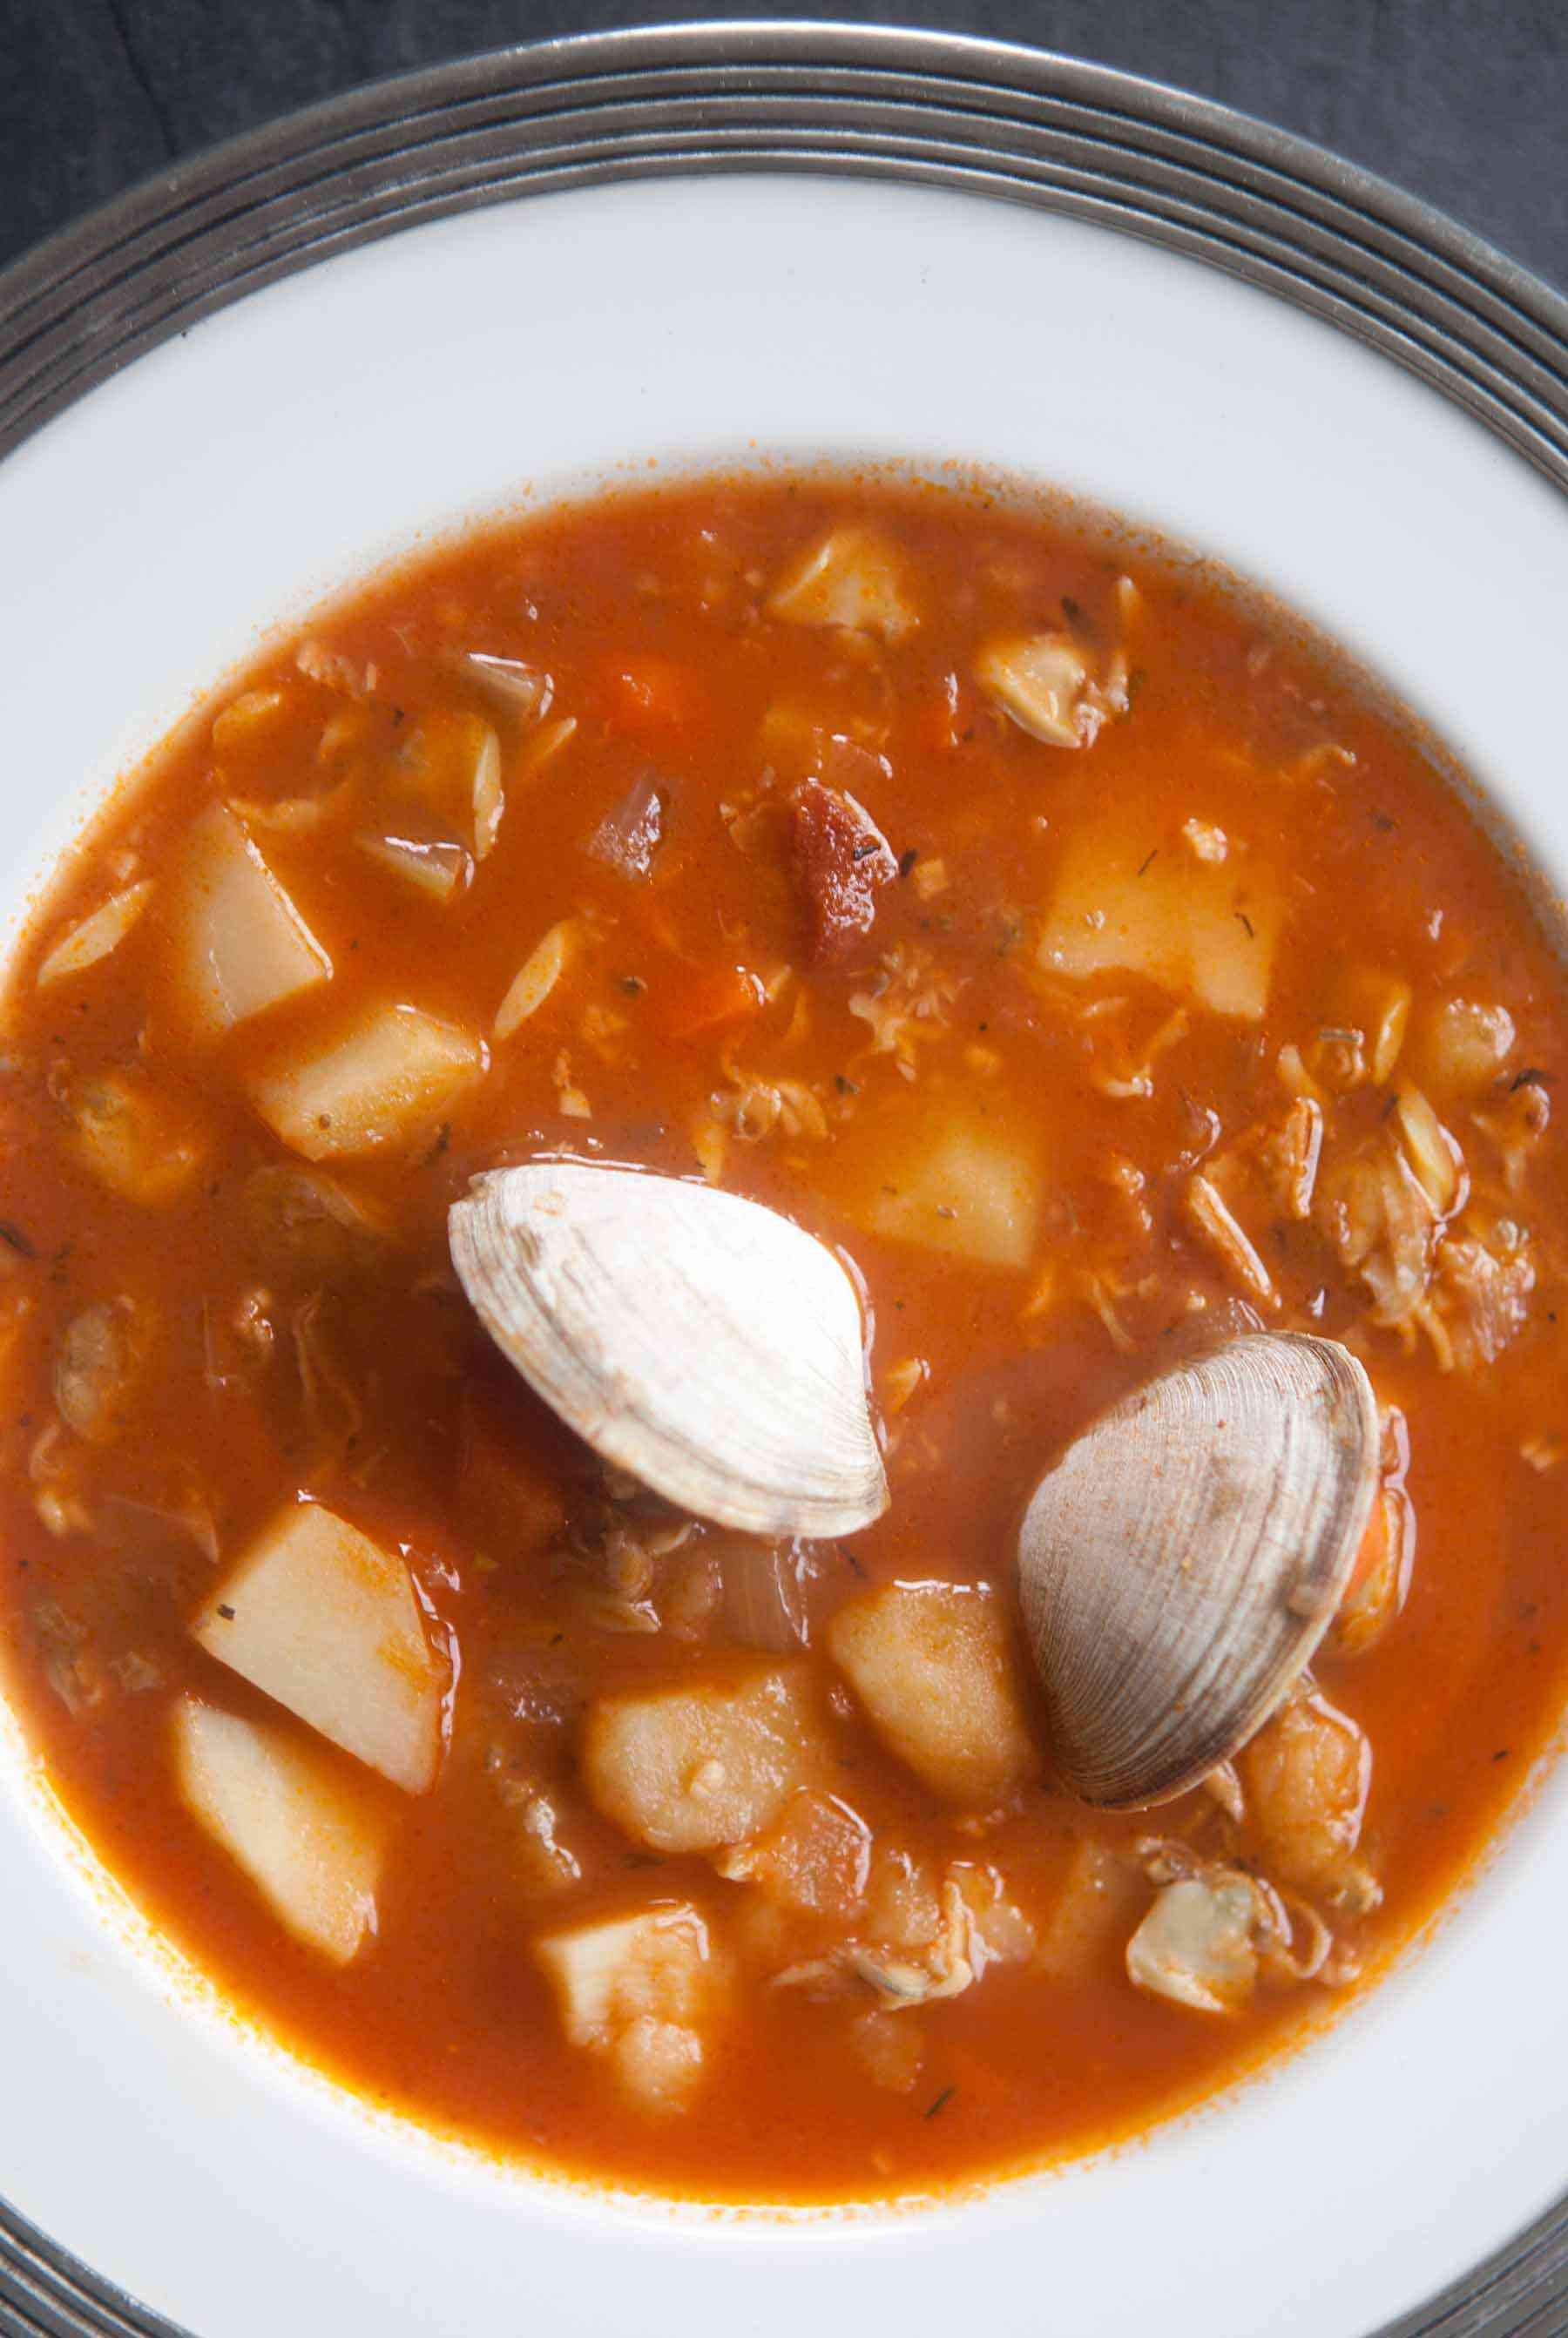 manhattan-clam-chowder-vertical-a-1800